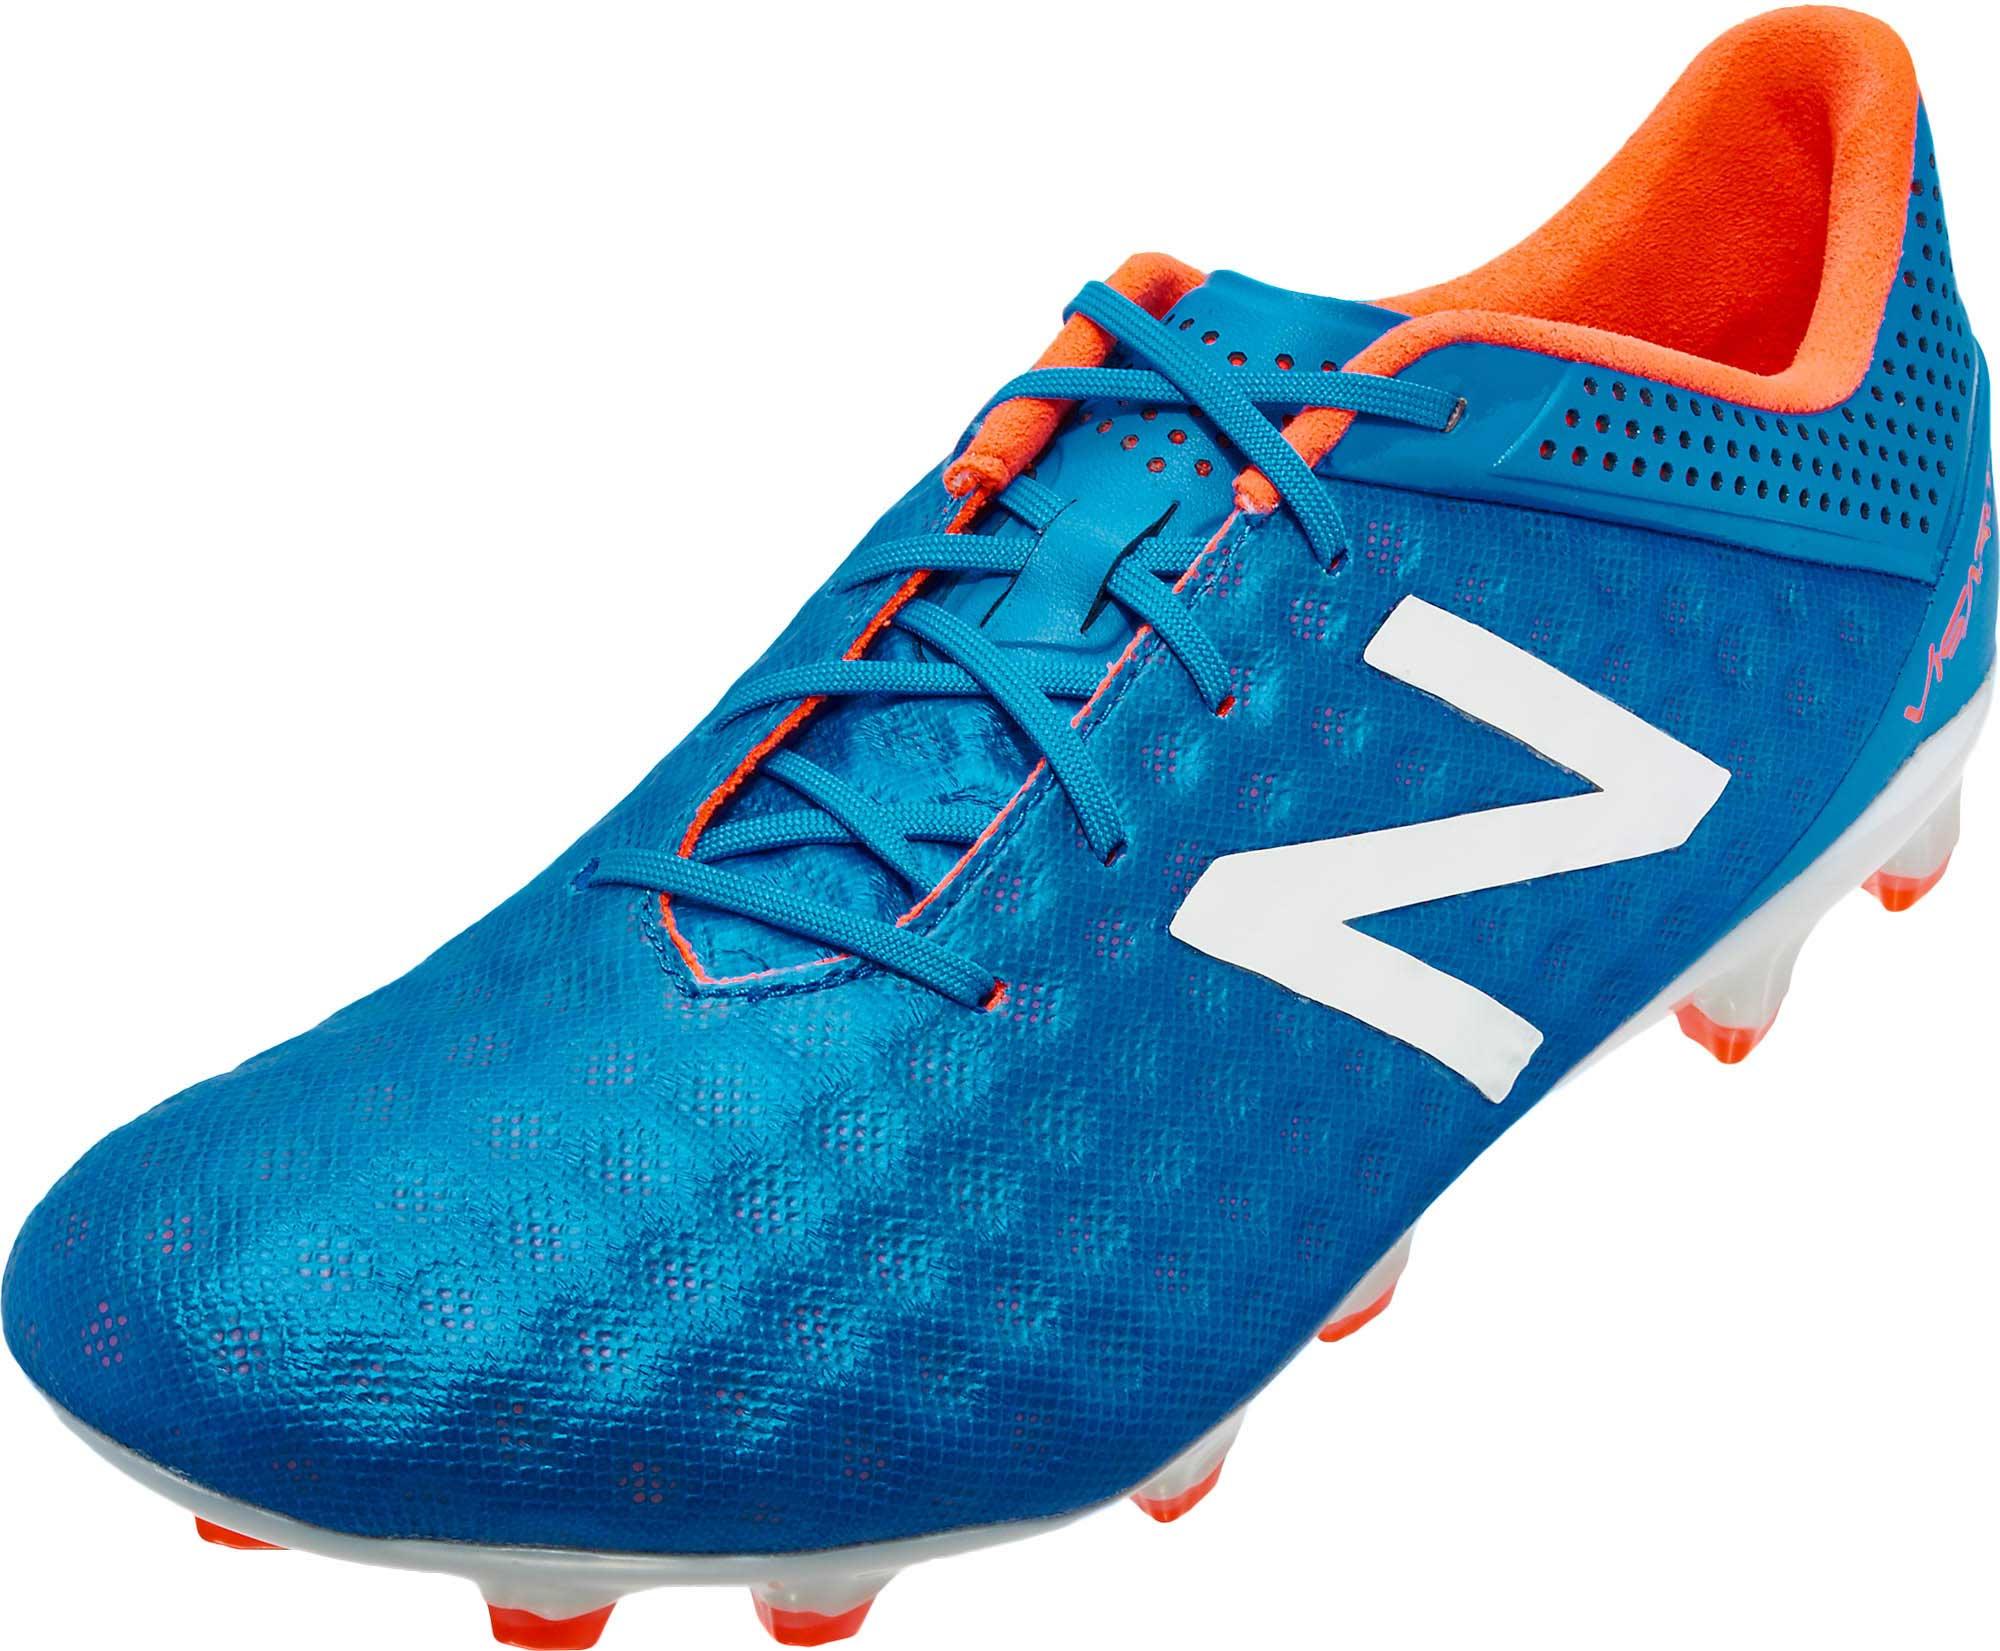 New Balance Visaro Pro (wide) FG Soccer